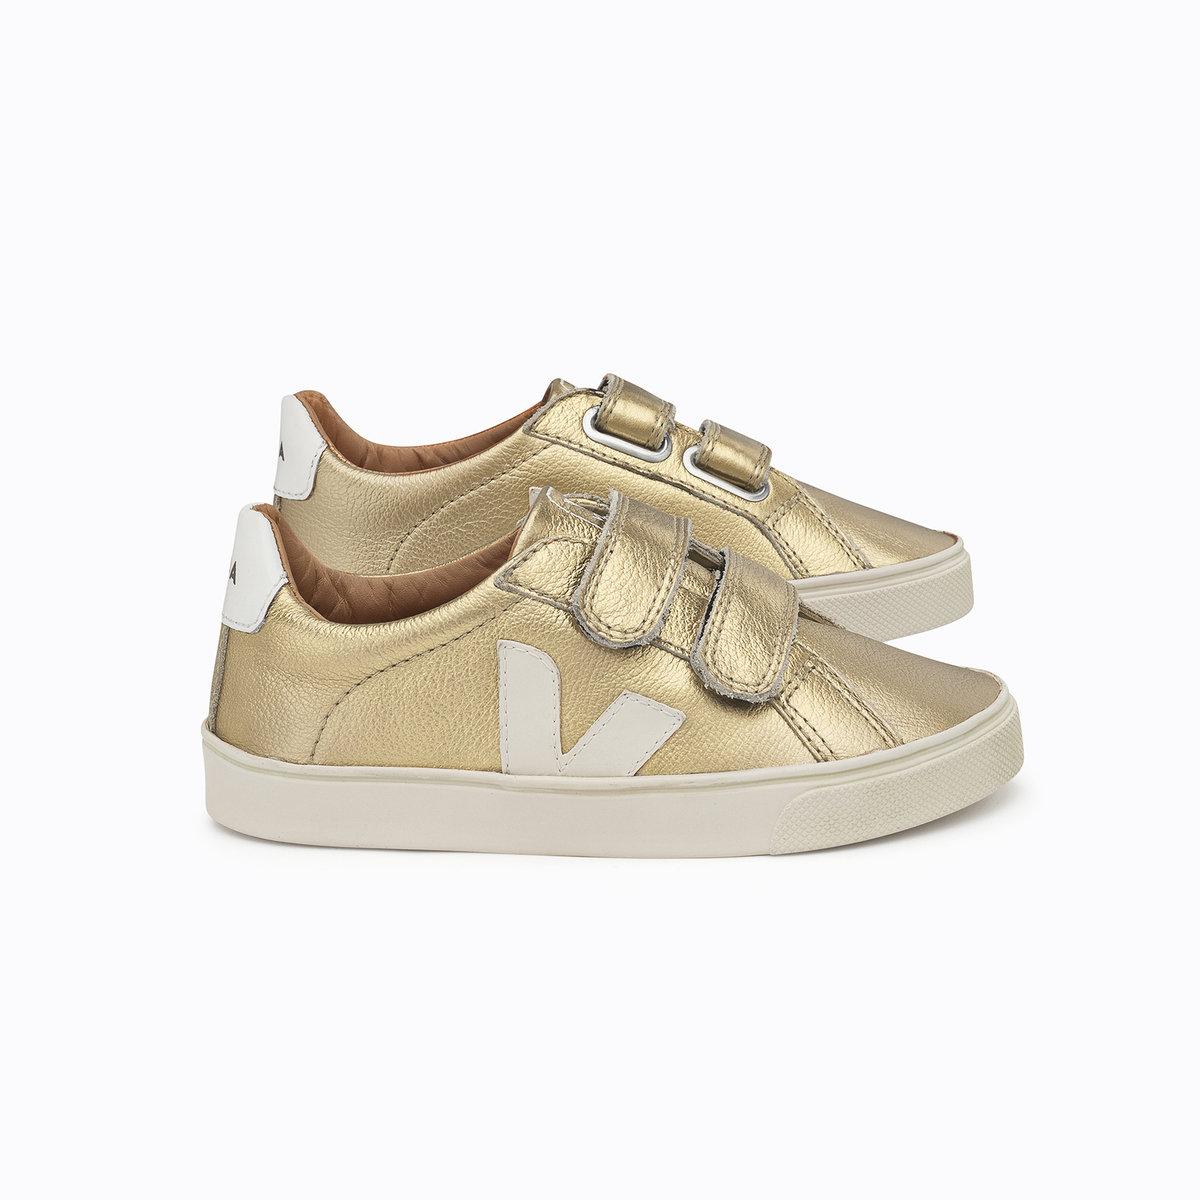 3ce270bee3 Esplar Velcro Leather Gold